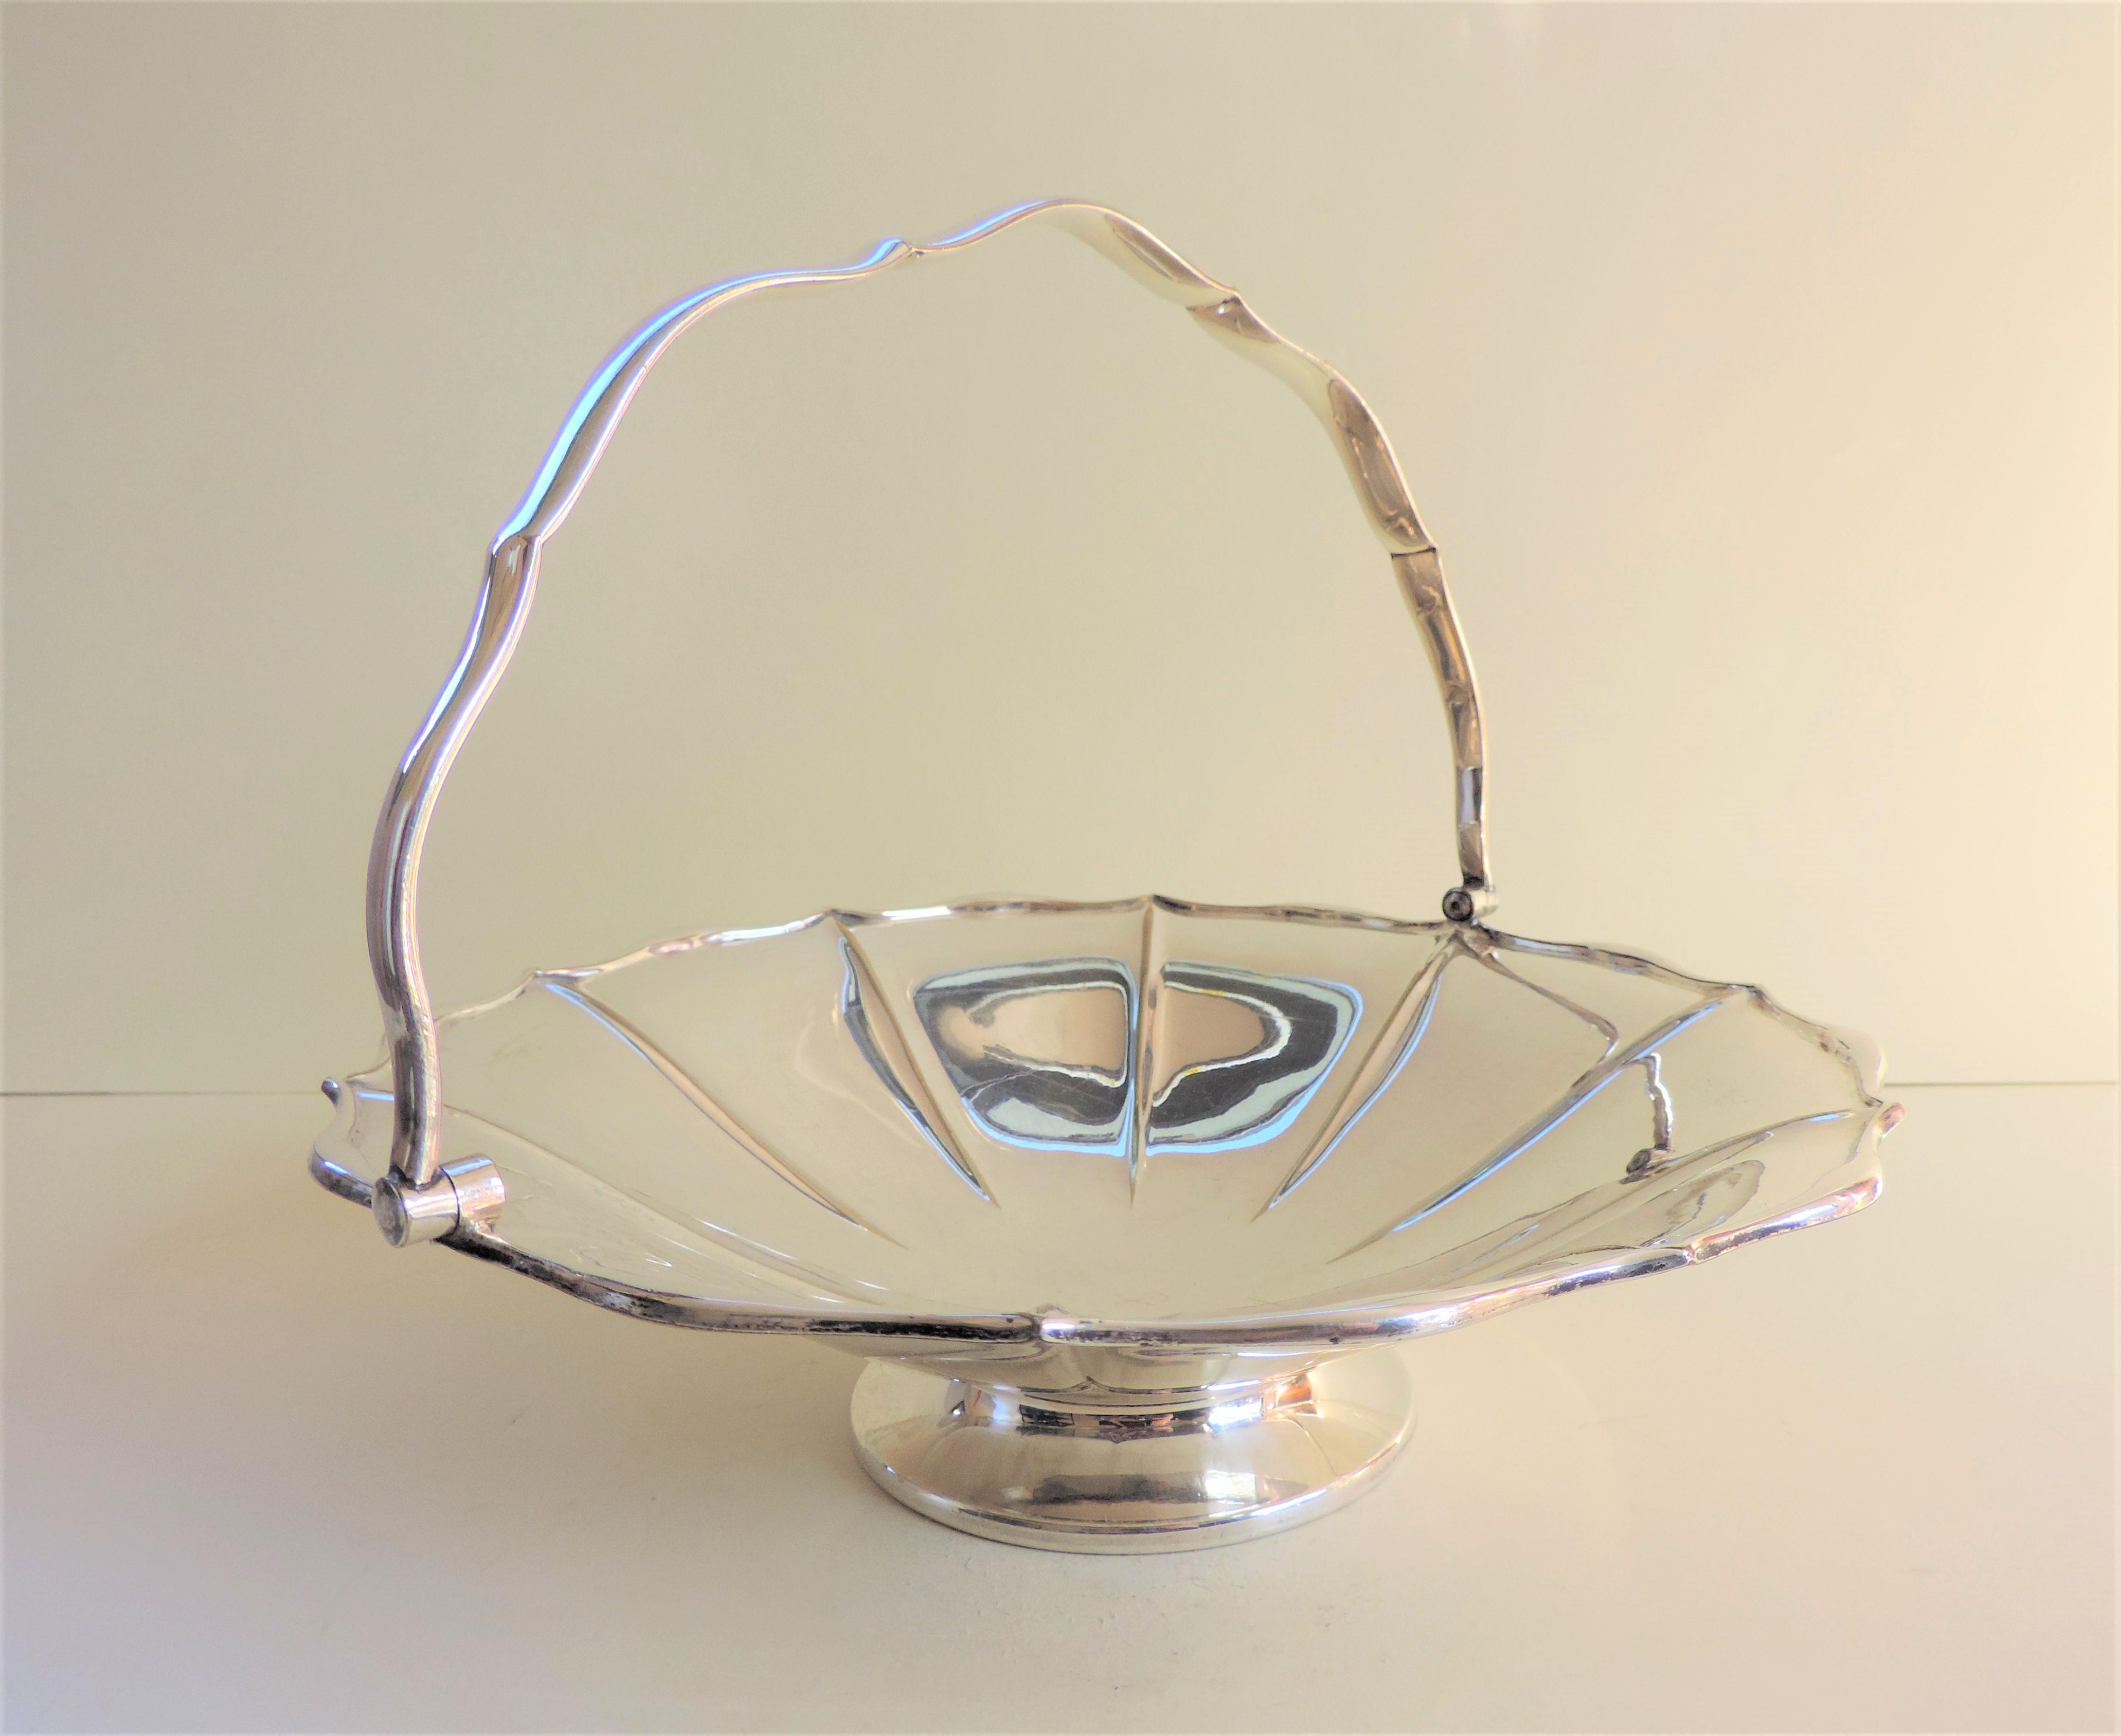 Antique Art Nouveau Mappin & Webb Silver Plated Cake/Bread Basket